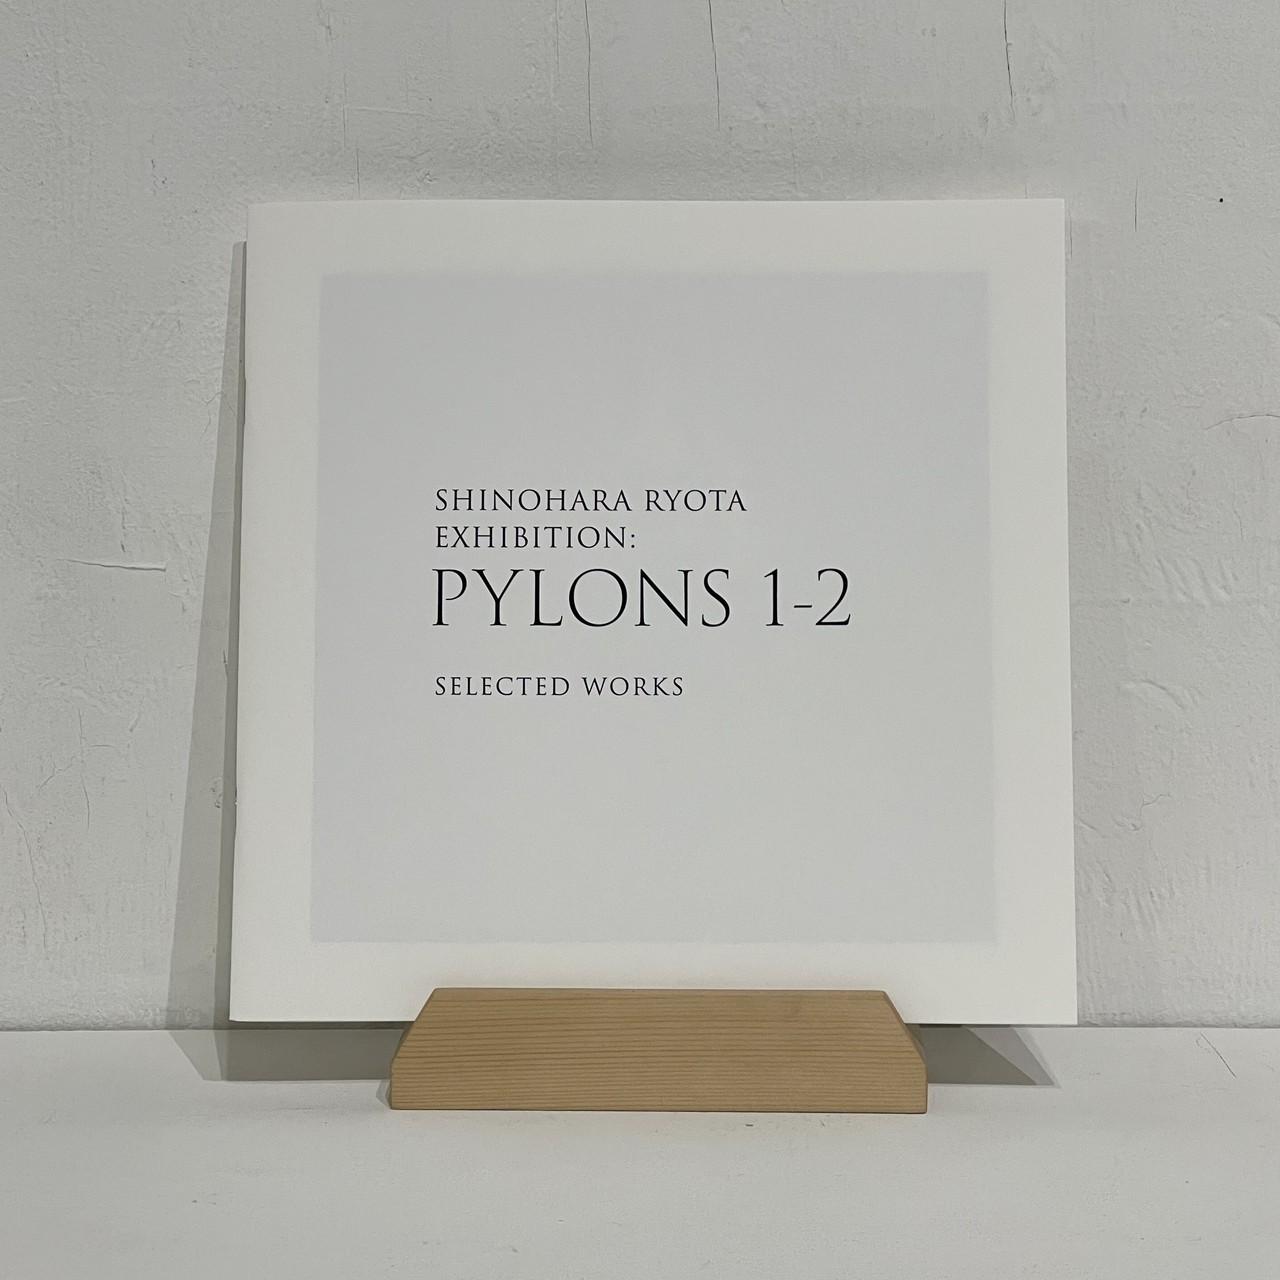 篠原良太|作品集「PYLONS 1-2」 Artist Book SHINOHARA RYOTA